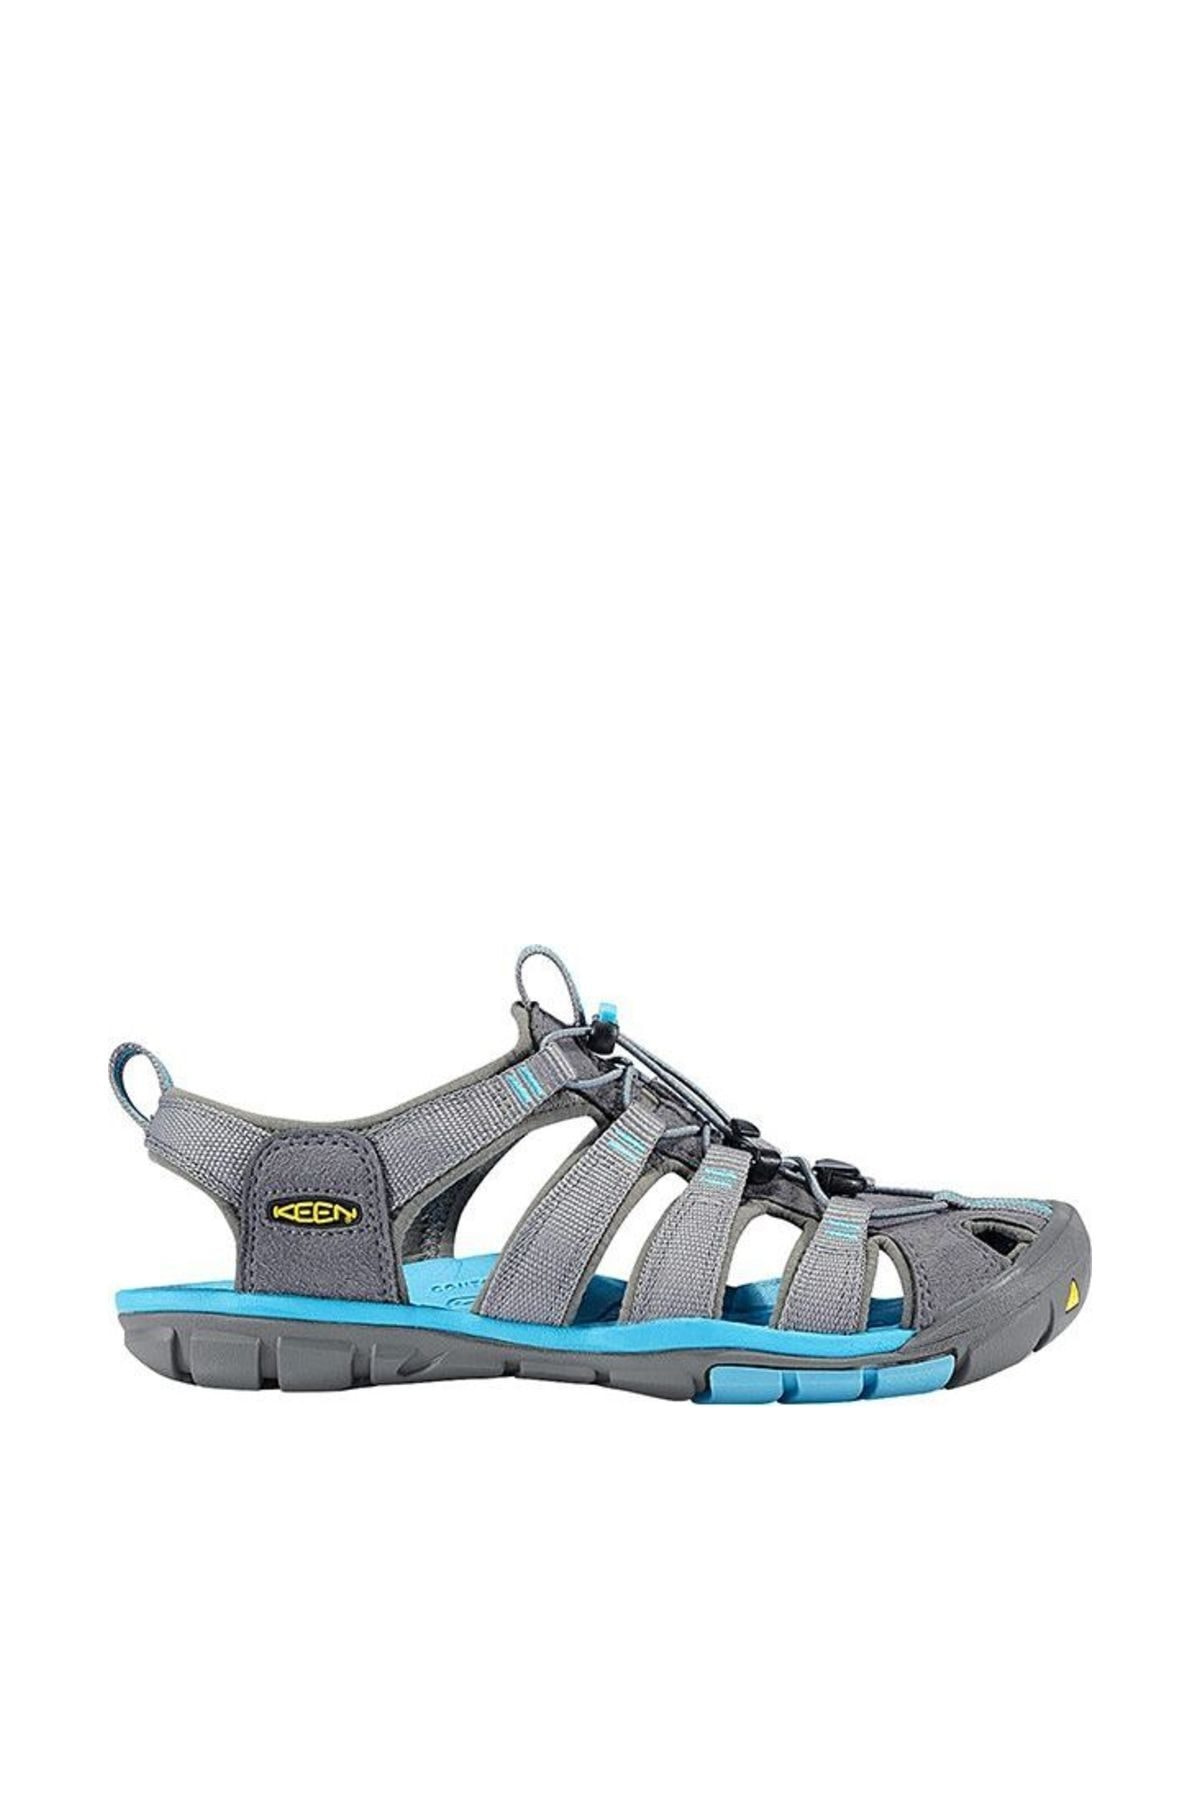 Keen Clearwater Cnx Kadın Sandalet 1008772 2